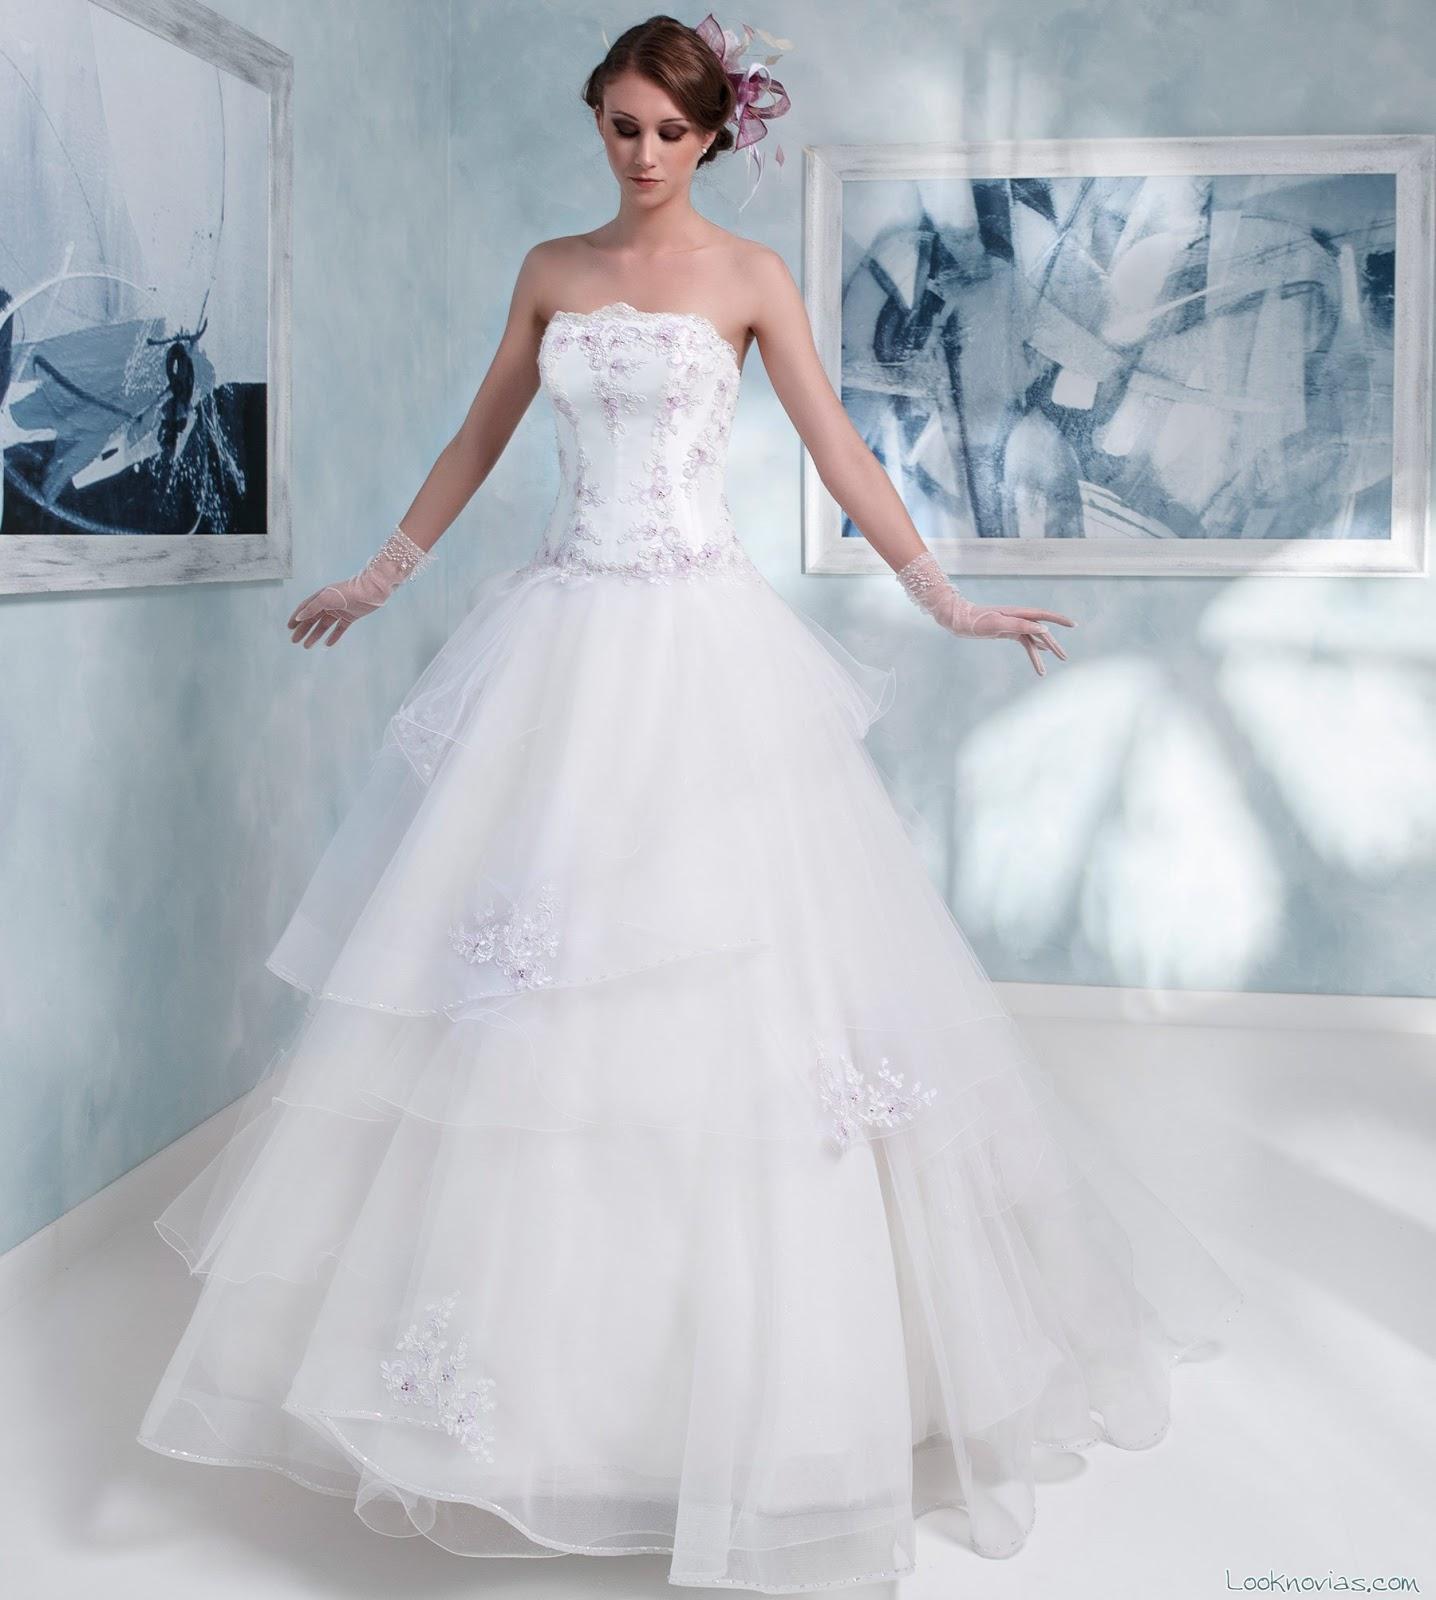 Vestidos de novia juveniles ¡INCREÍBLES TENDENCIAS EN MODA! | Somos ...